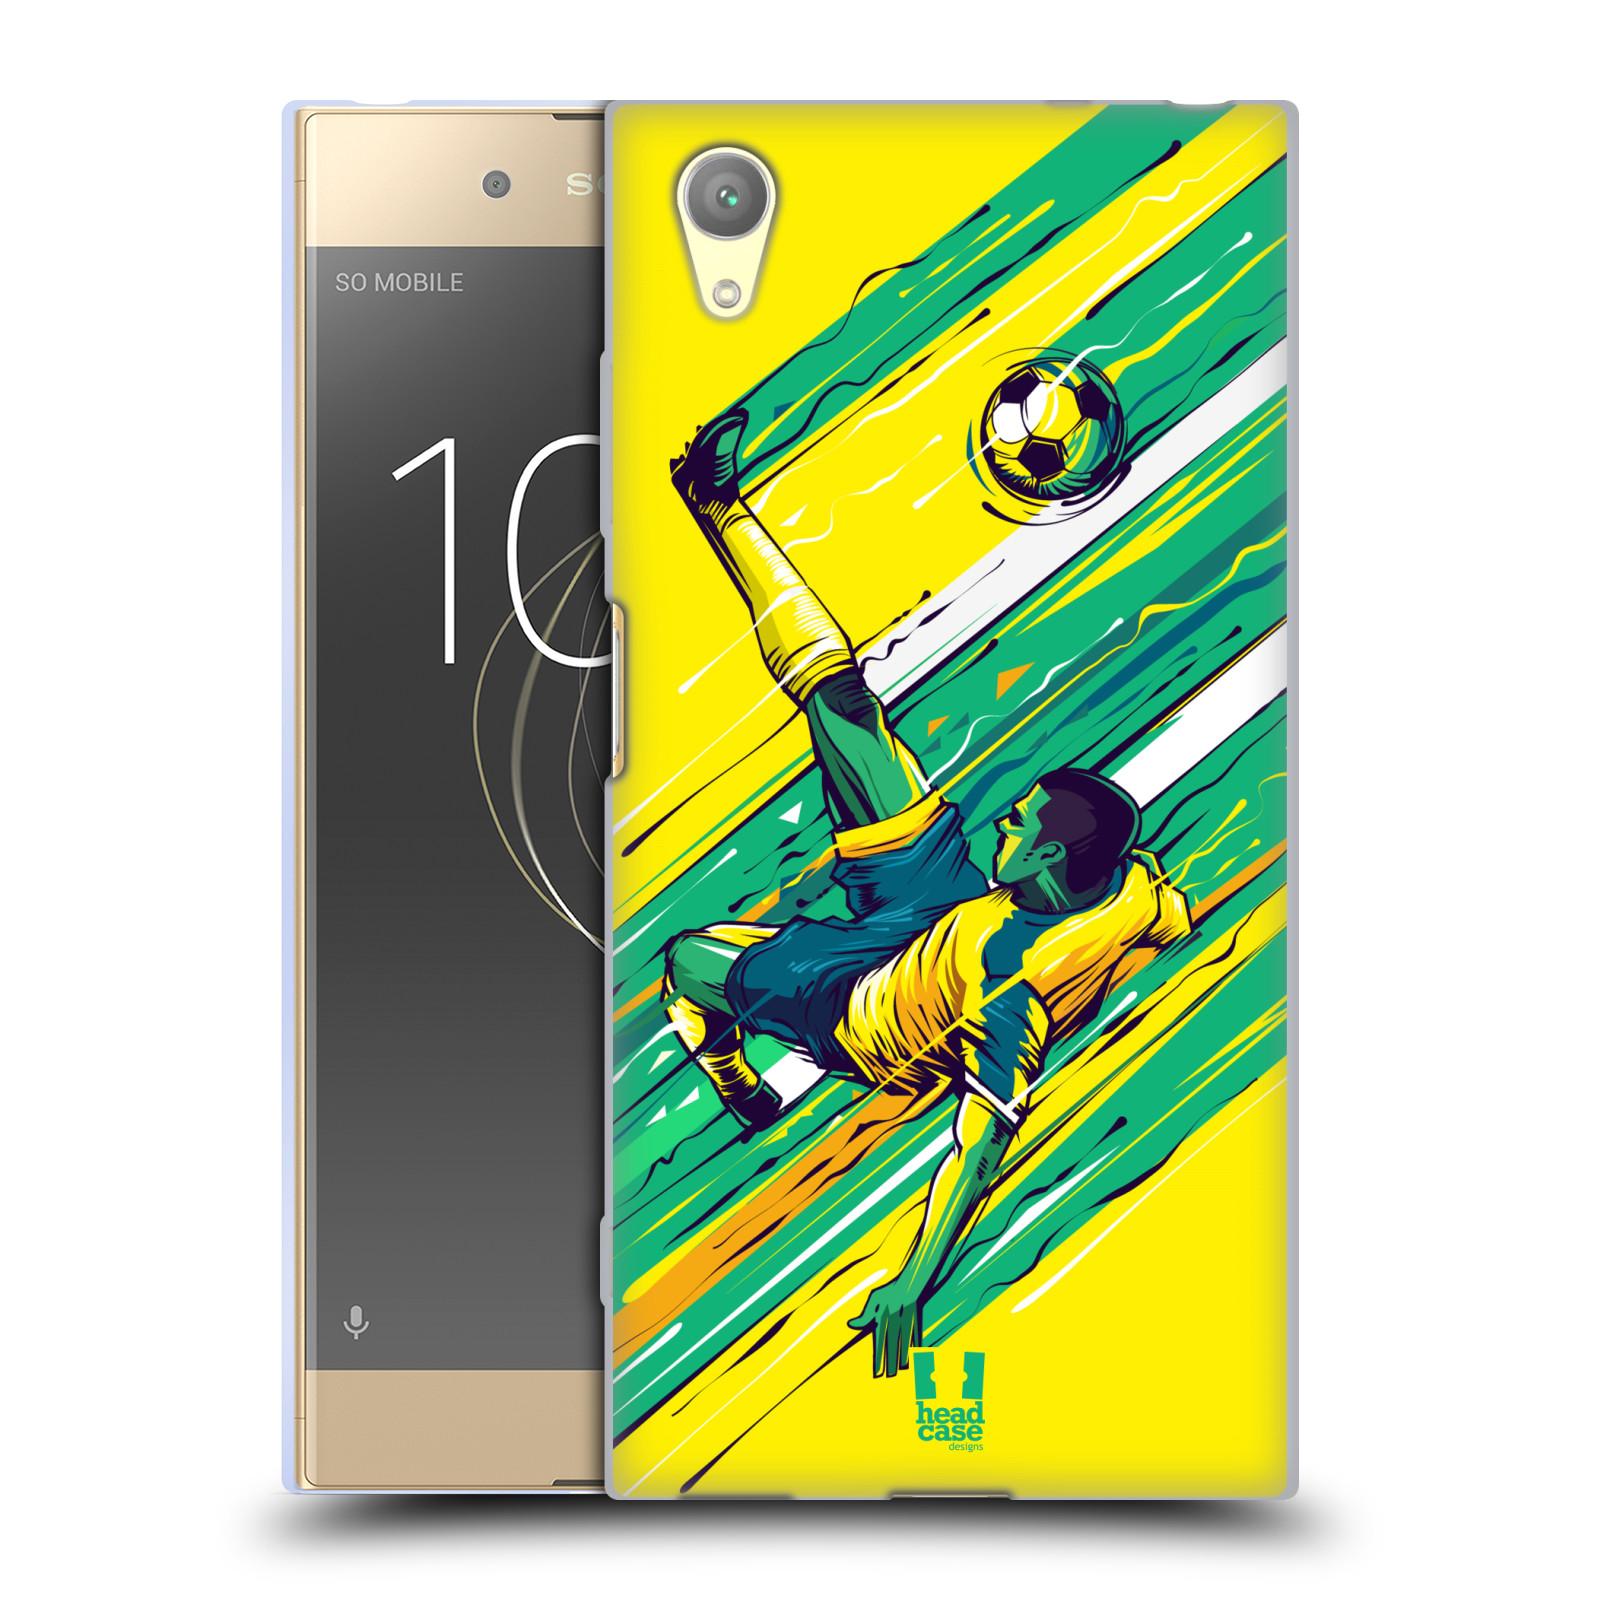 HEAD CASE silikonový obal na mobil Sony Xperia XA1 PLUS Sport fotbal kreslený nůžky